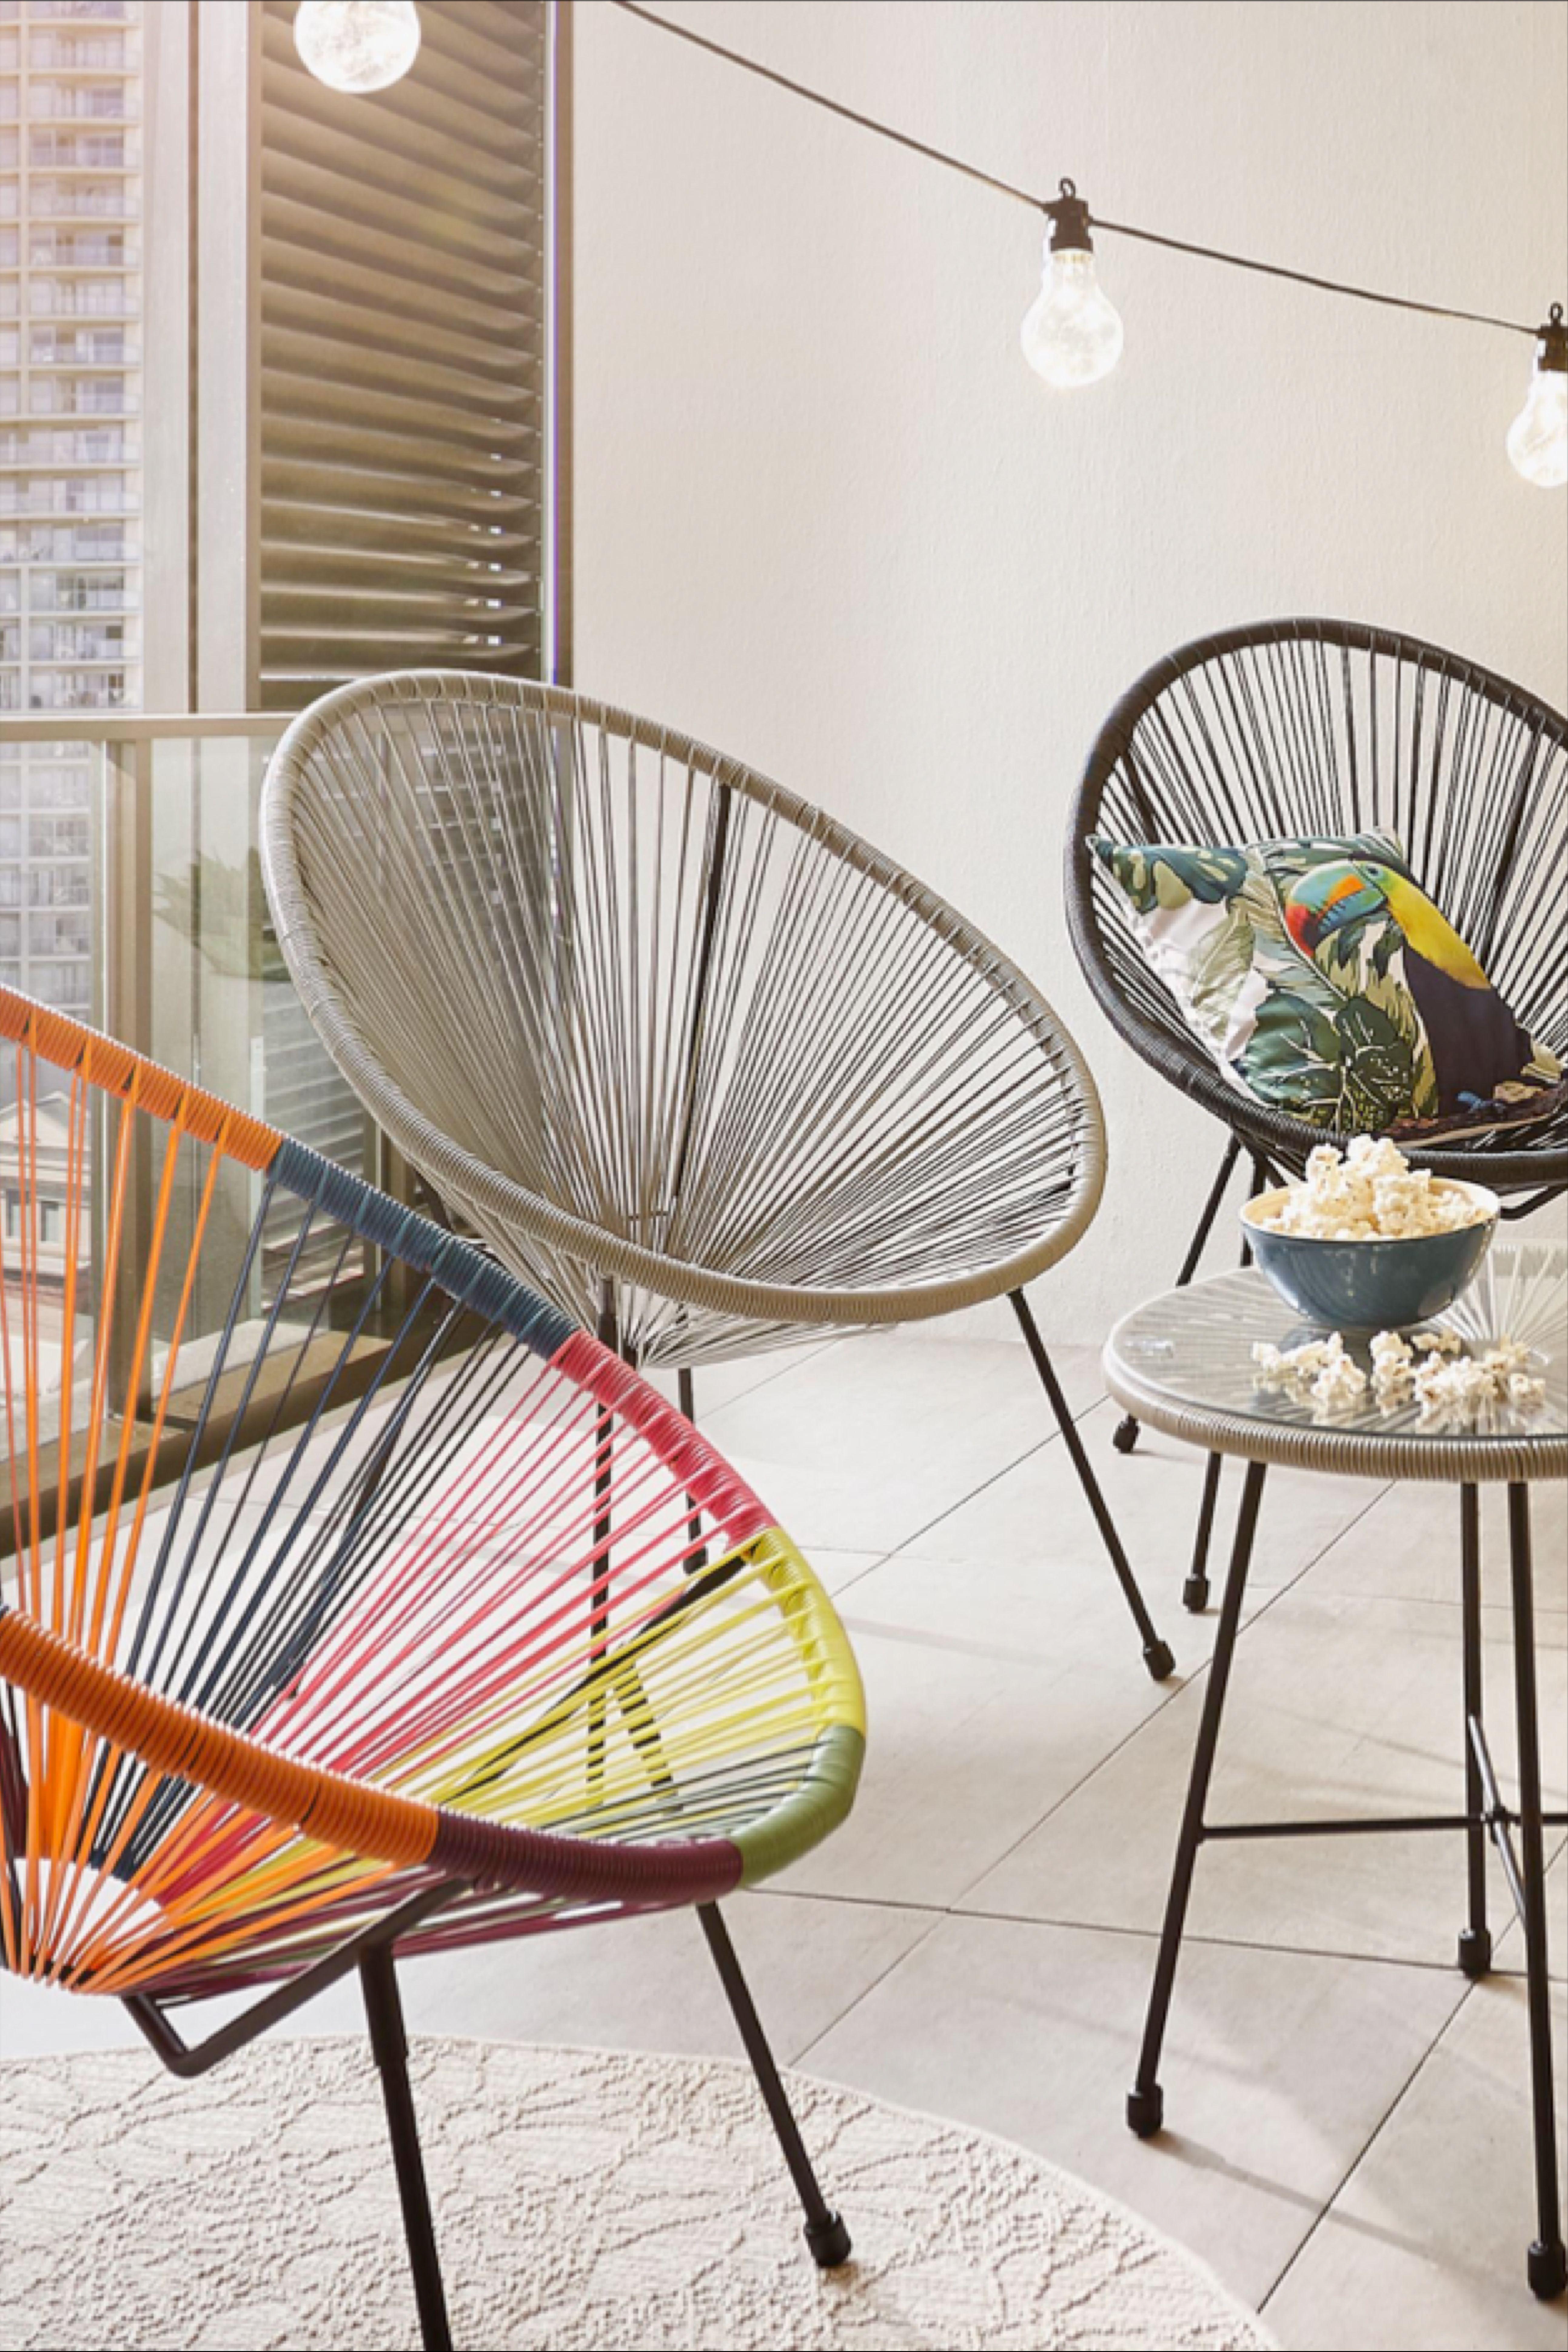 Bunter Summerflair Auf Dem Balkon Haus Deko Coole Mobel Dekor